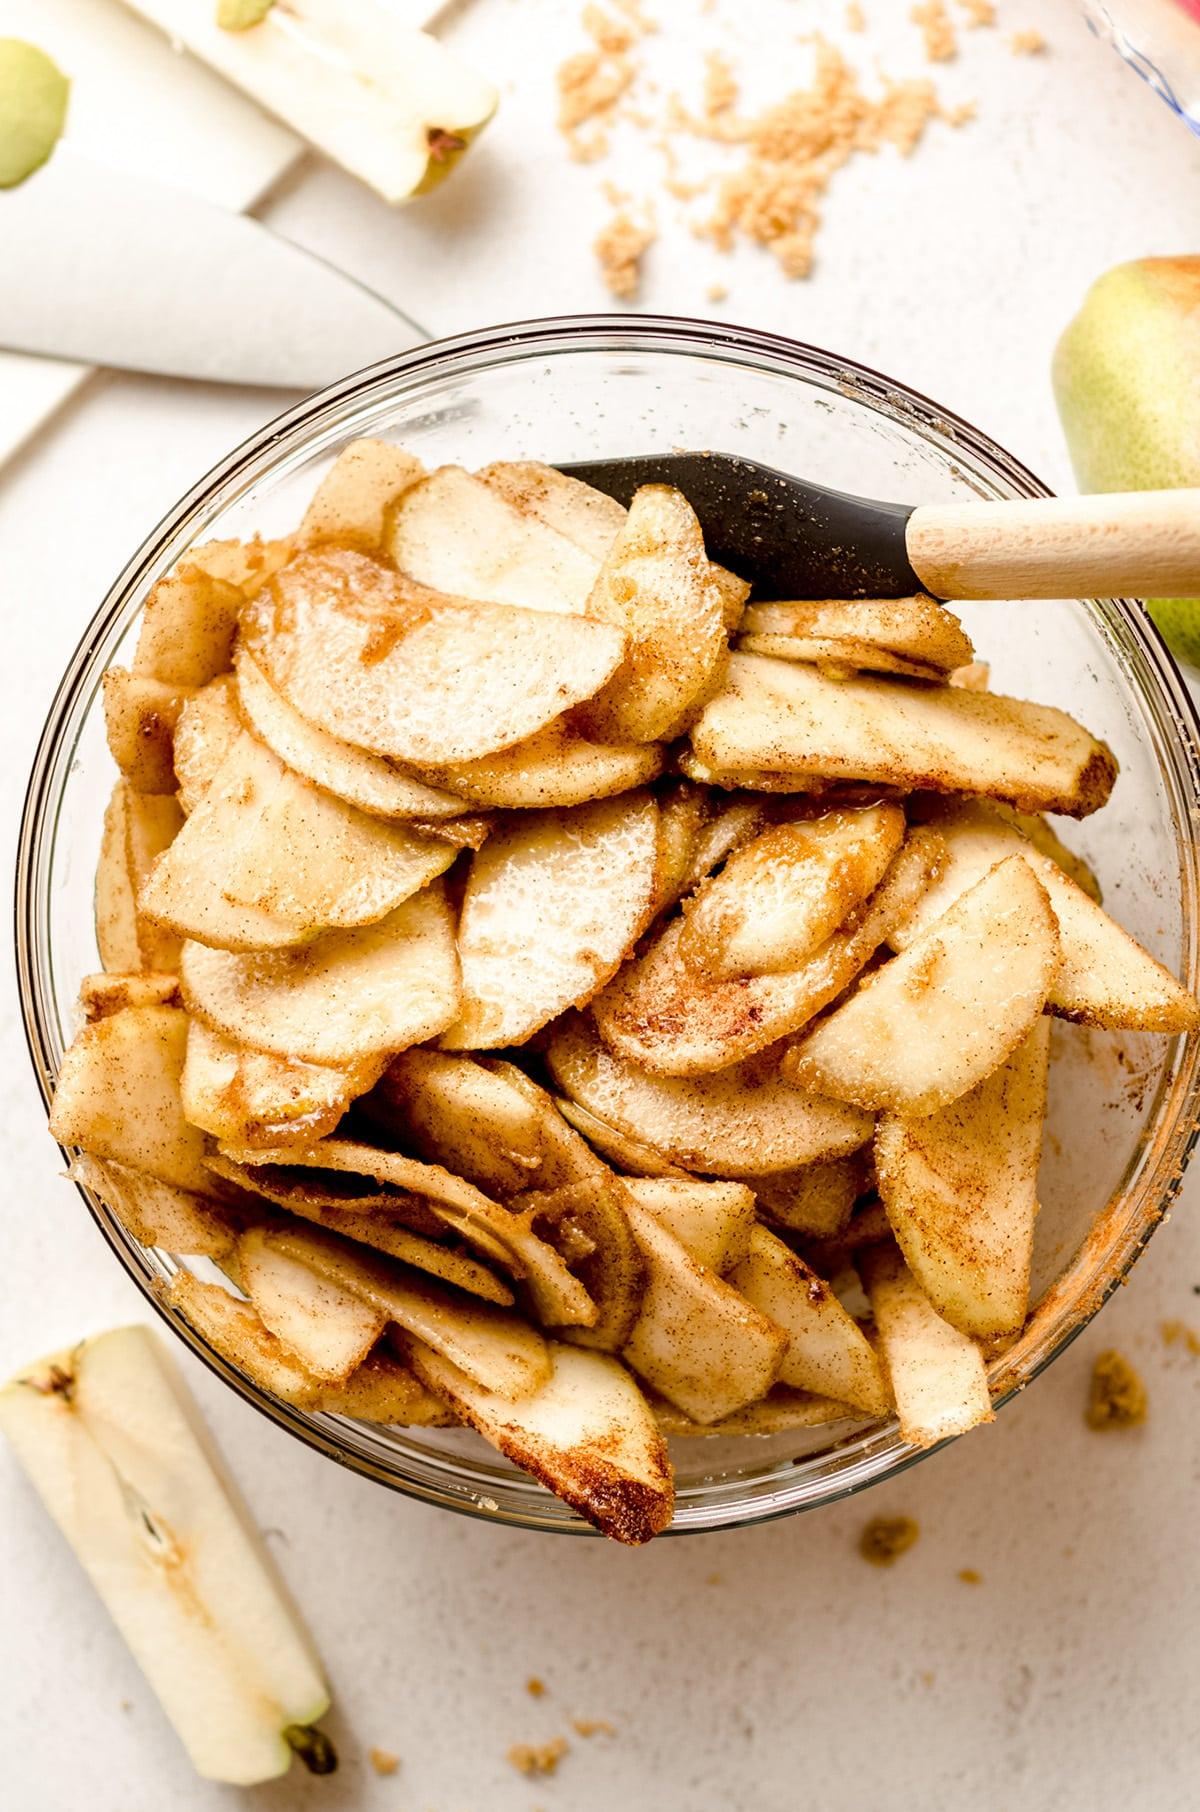 aerial photo of pears tossed in brown sugar and cinnamon